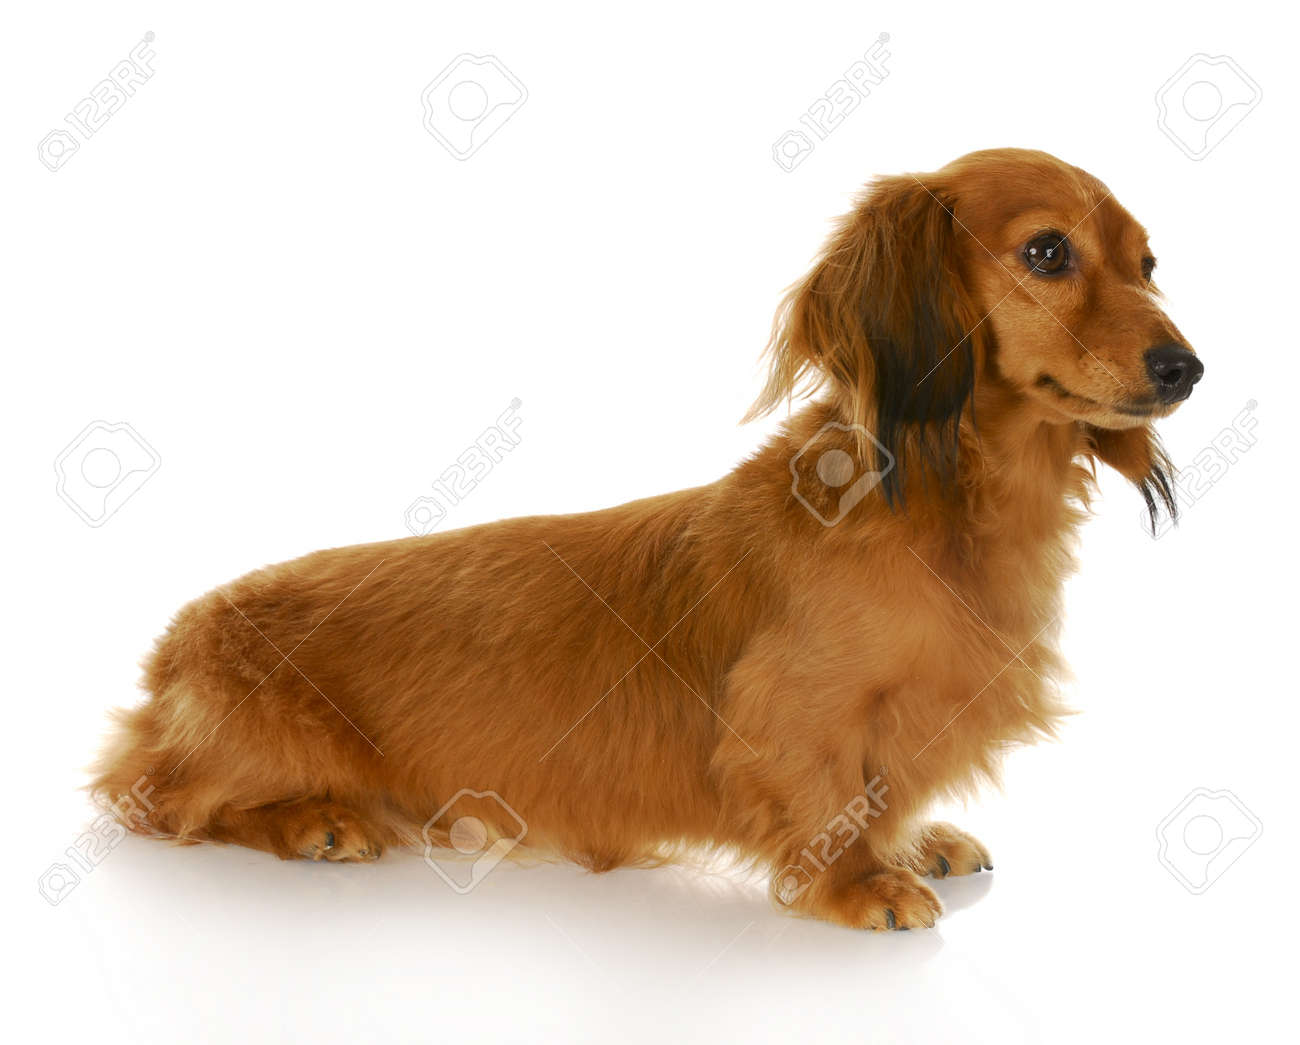 How long is a miniature dachshund